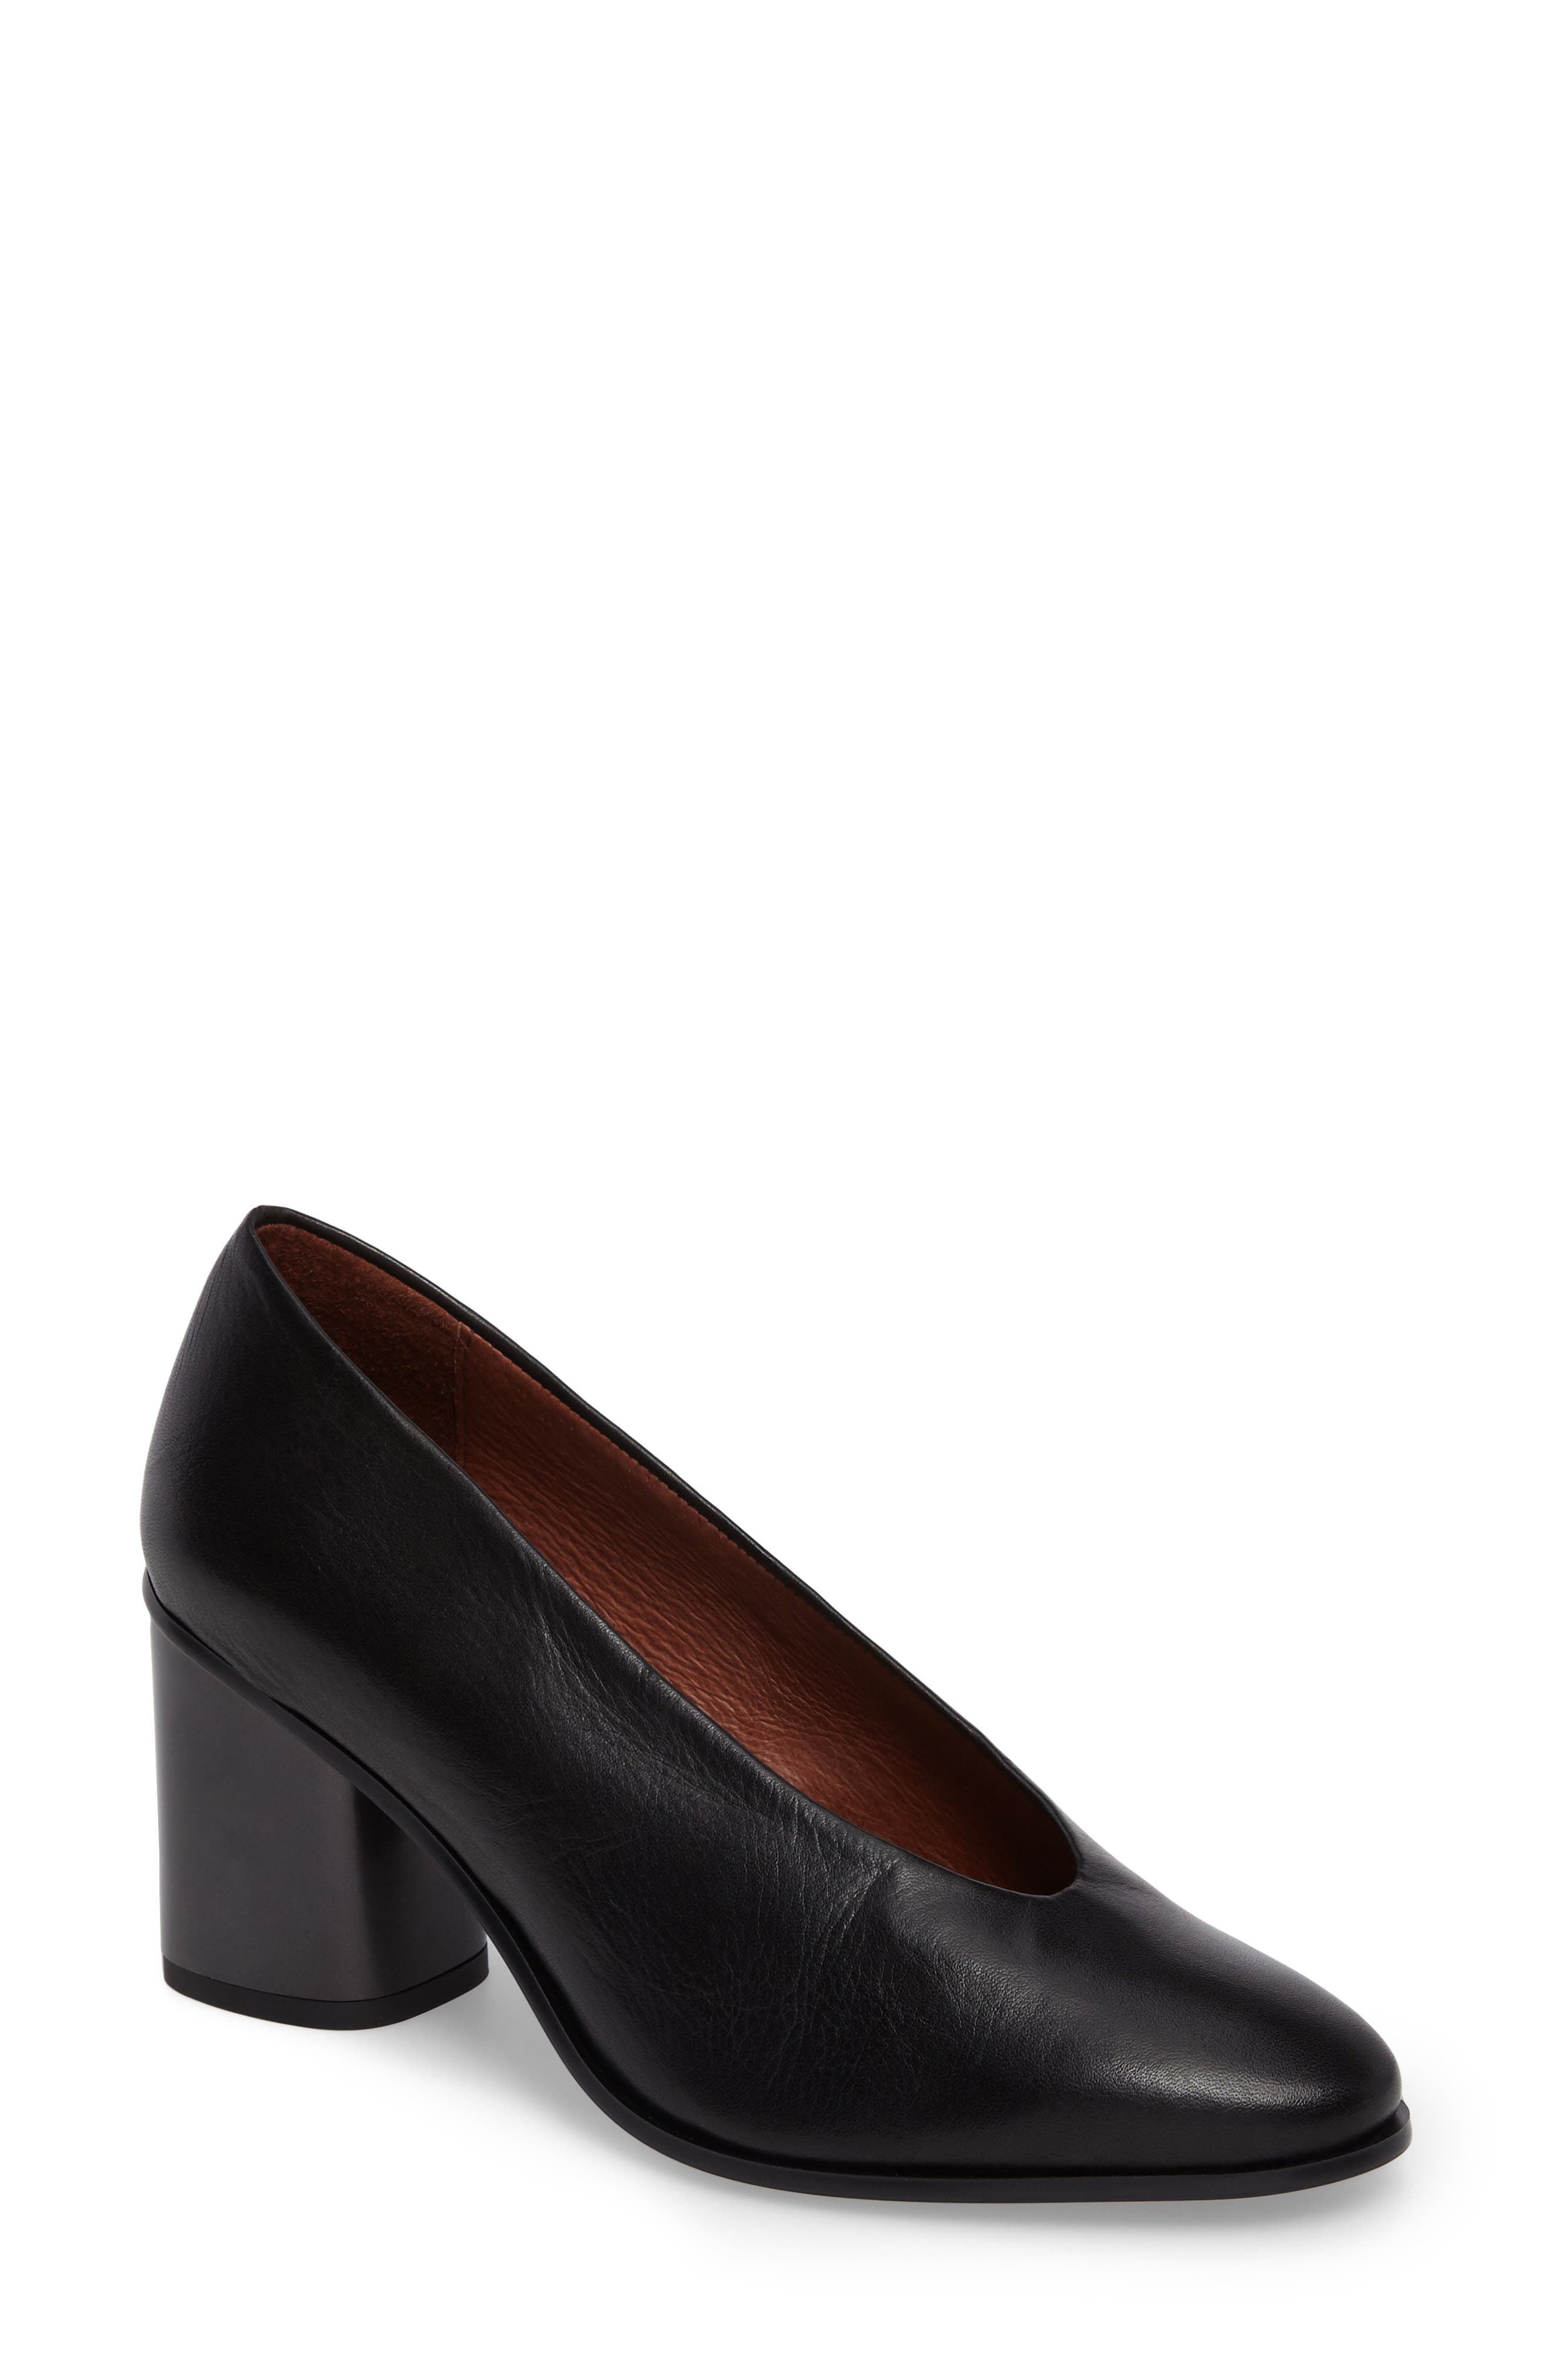 Maddie Block Heel Pump,                             Main thumbnail 1, color,                             Soho Black Leather